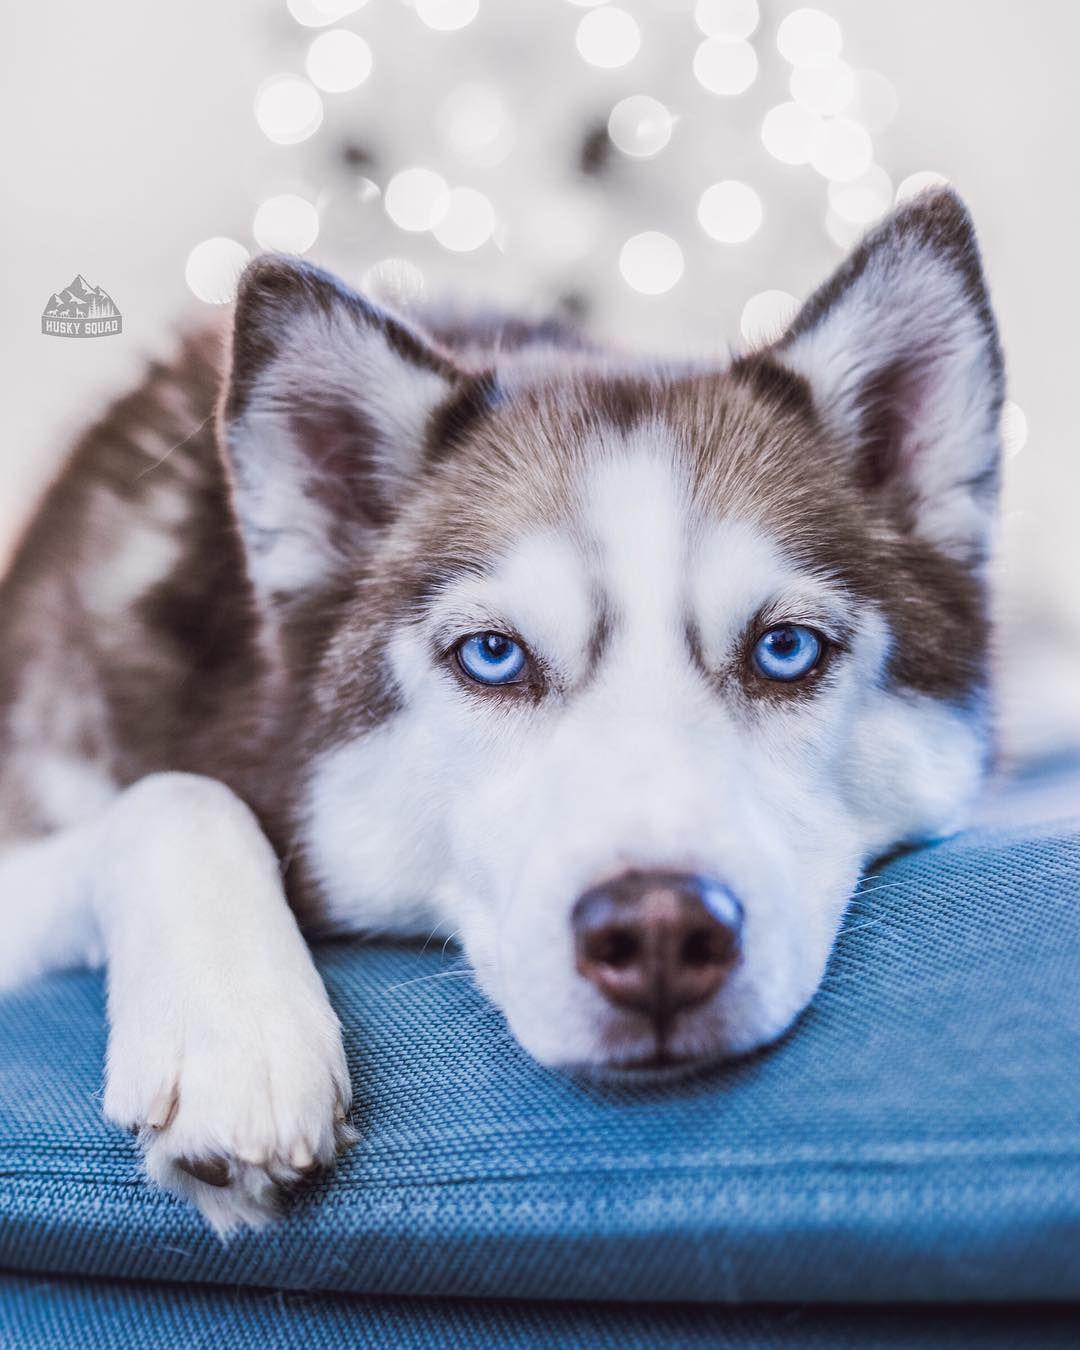 Pin By Kim Petrie On Mondaho Husky Cute Baby Animals Dogs